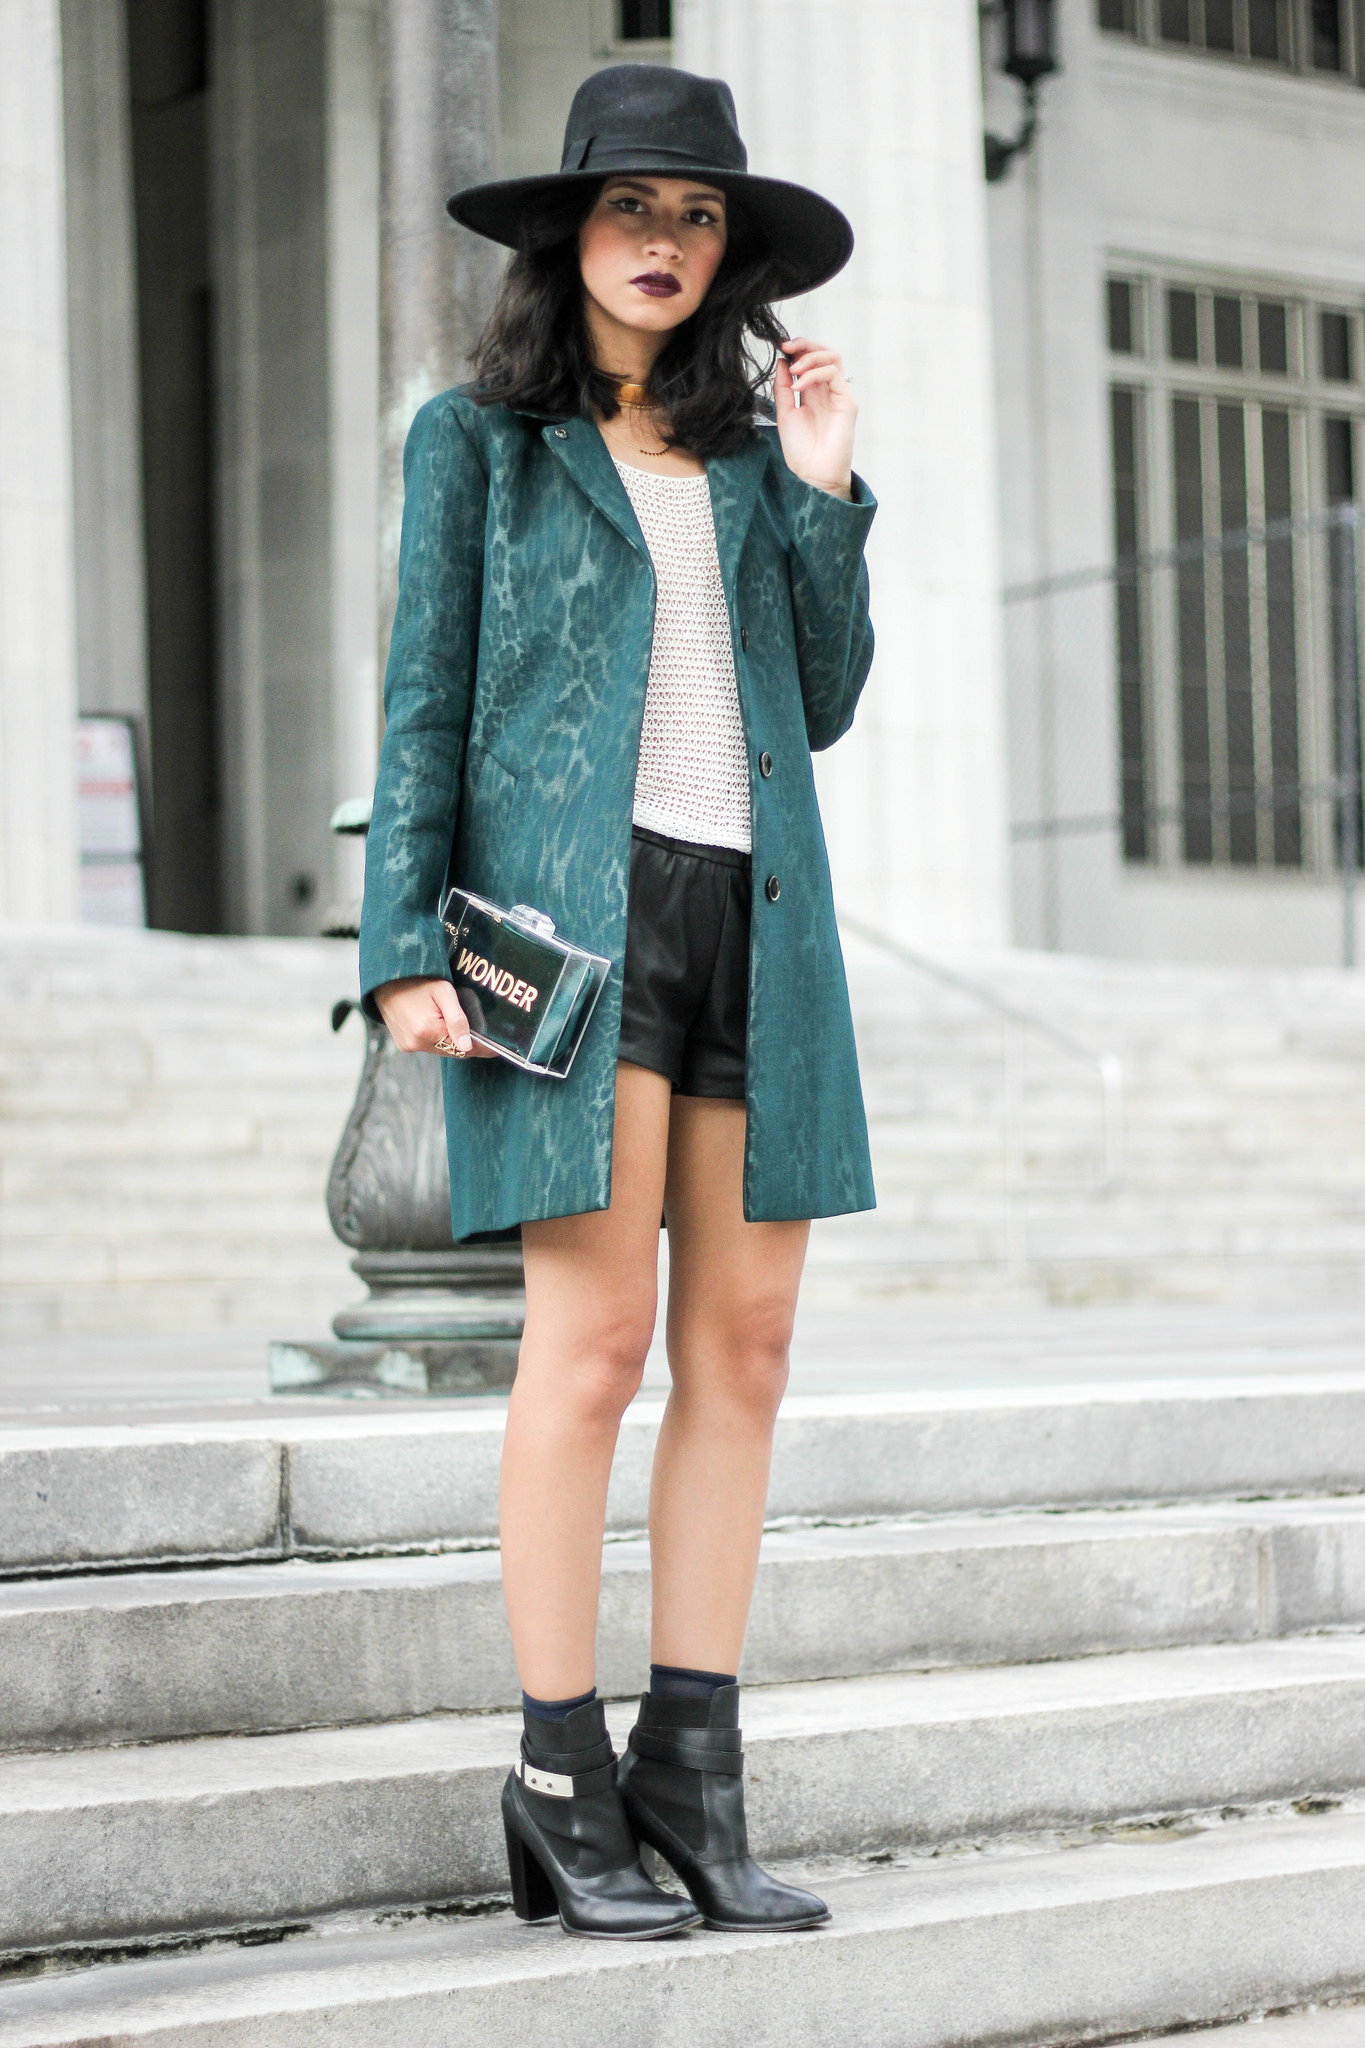 Sandro Paris x Saks , Urban Outfitters , Zara , wide brimmed hat , Vanessa Mooney , Gorjana Nordstrom